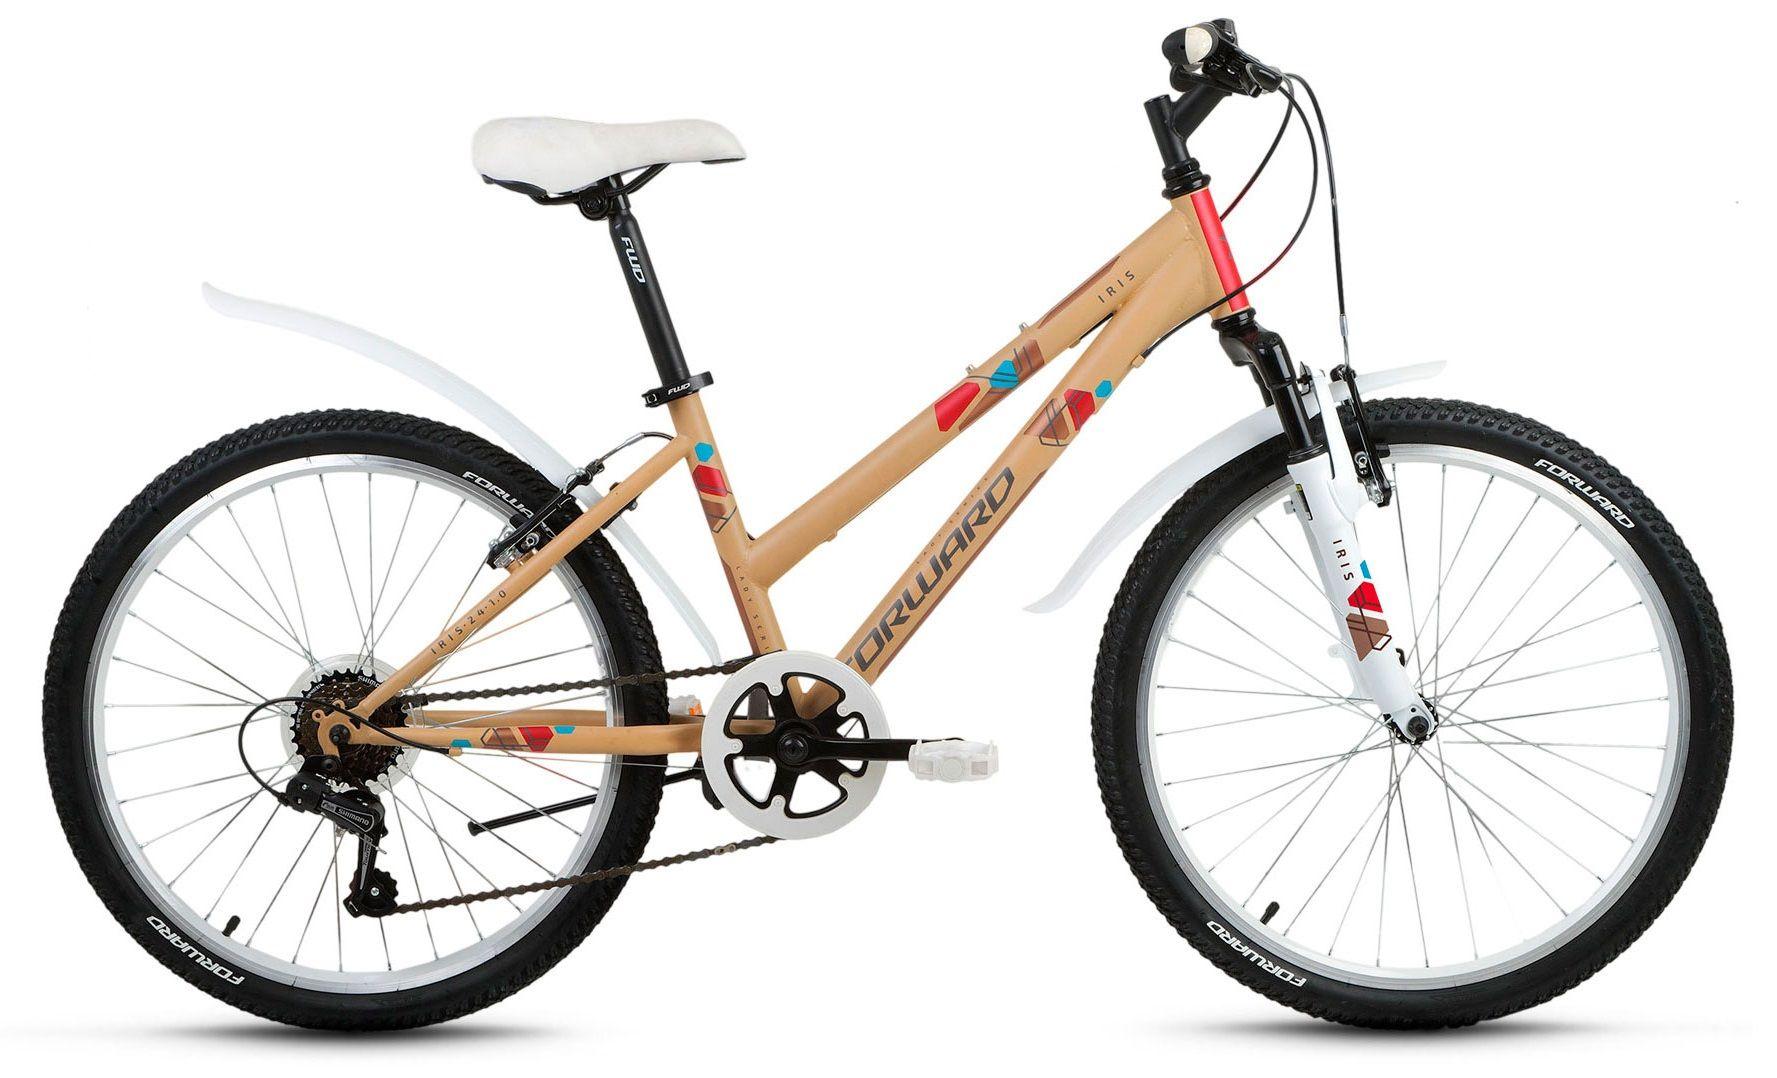 Велосипед Forward Iris 24 1.0 2018 велосипед forward iris 20 желтый ростовка 10 5